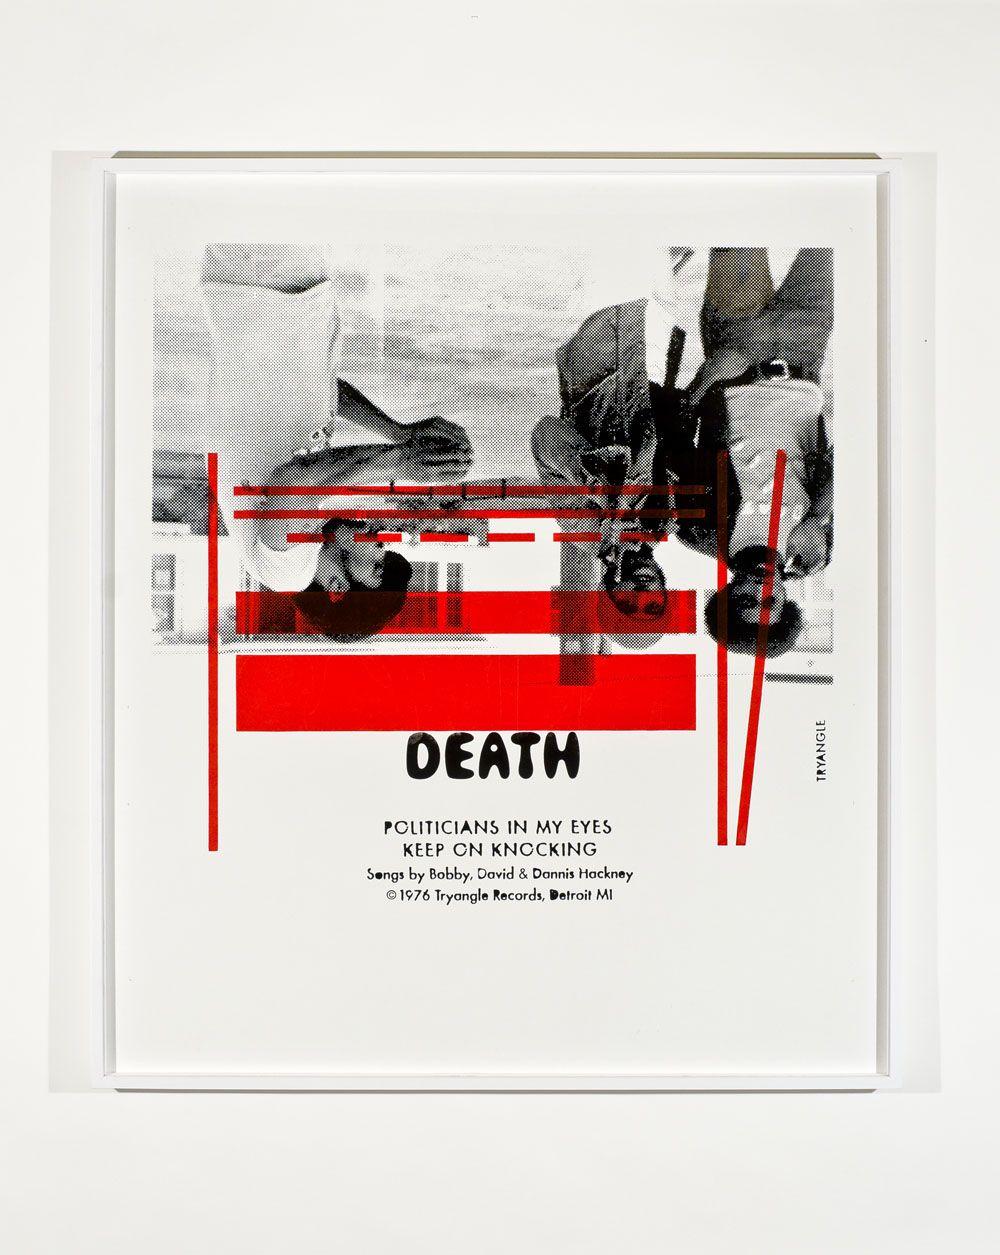 SKYLAR FEIN A Reductivist Portrait of Death,2011